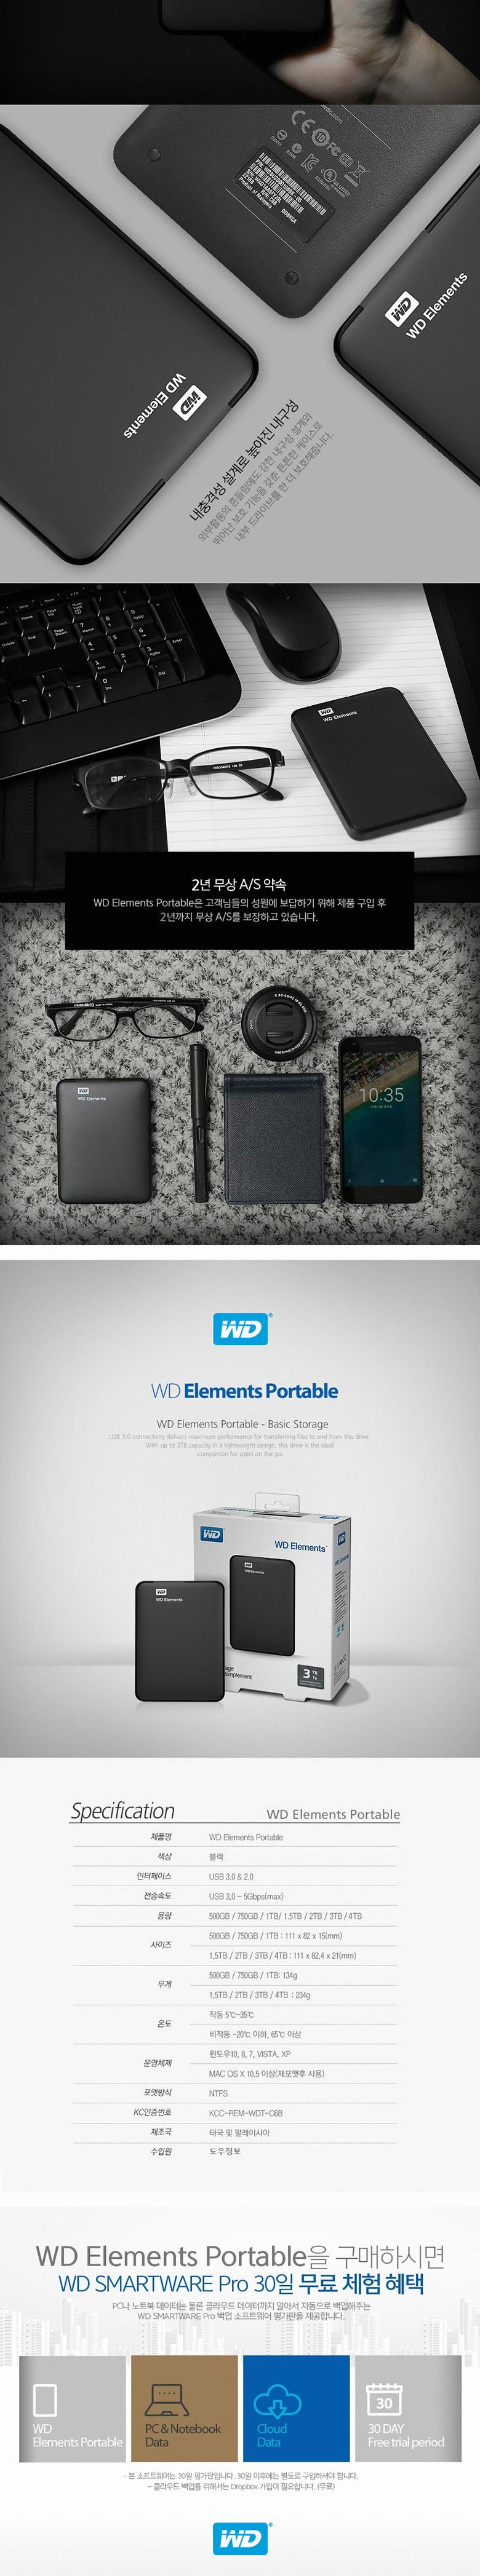 WD_Elements_Portable_03.jpg